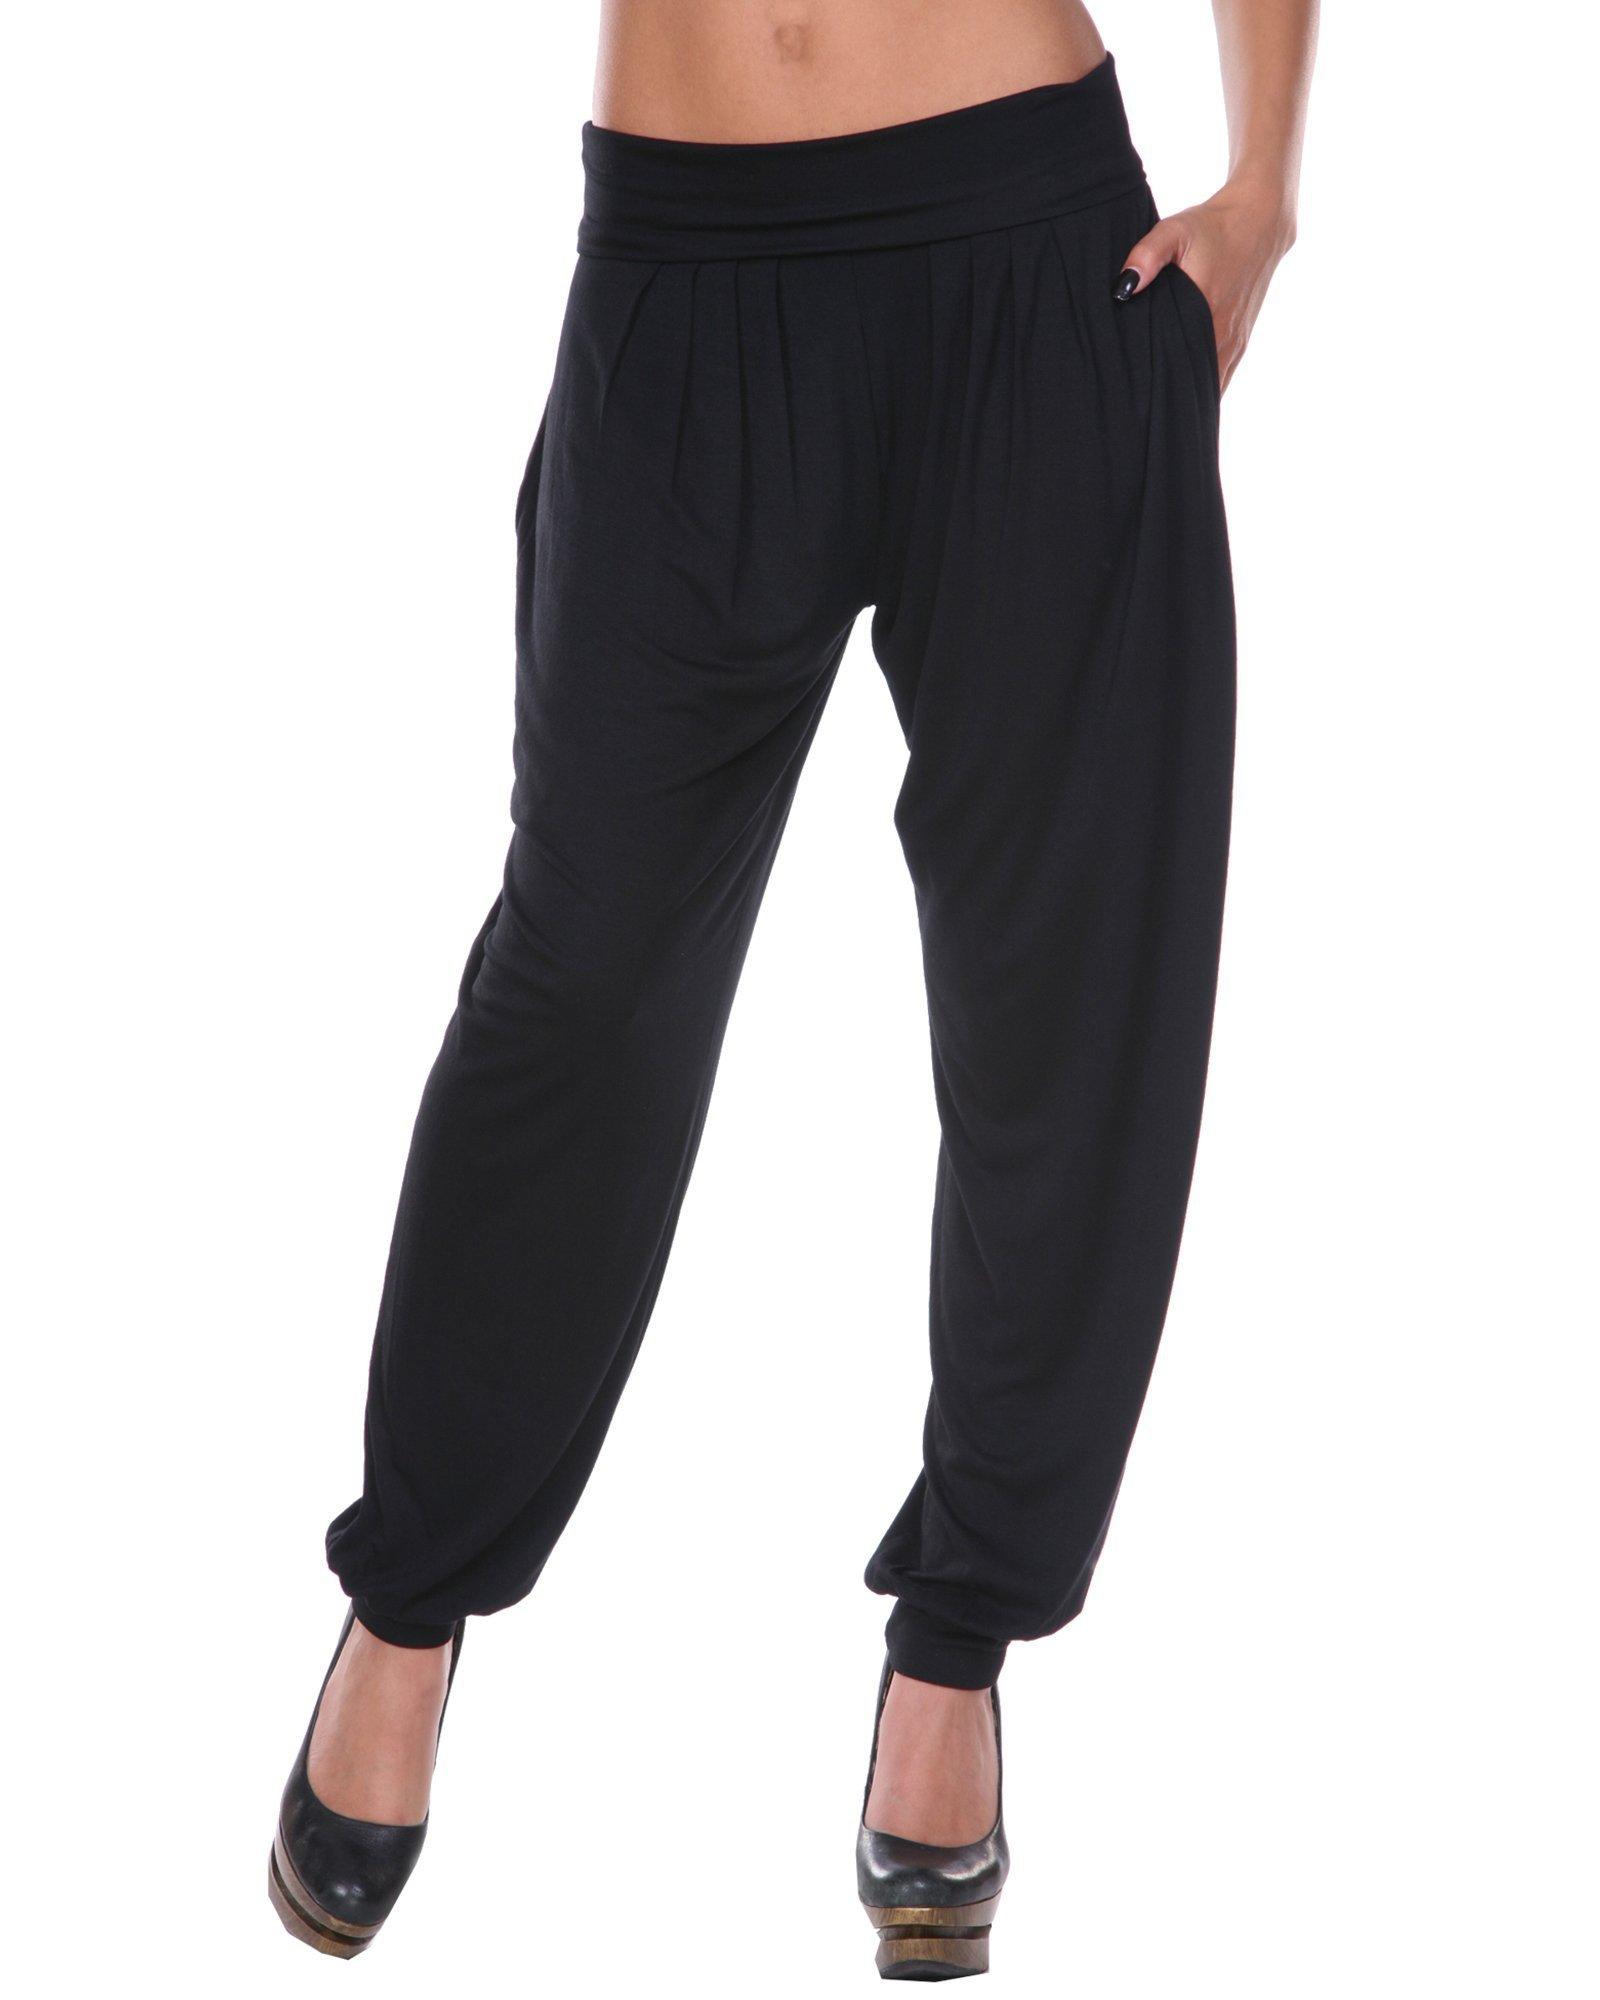 White Mark Women's Bohemian Harem Pants in Black - Large